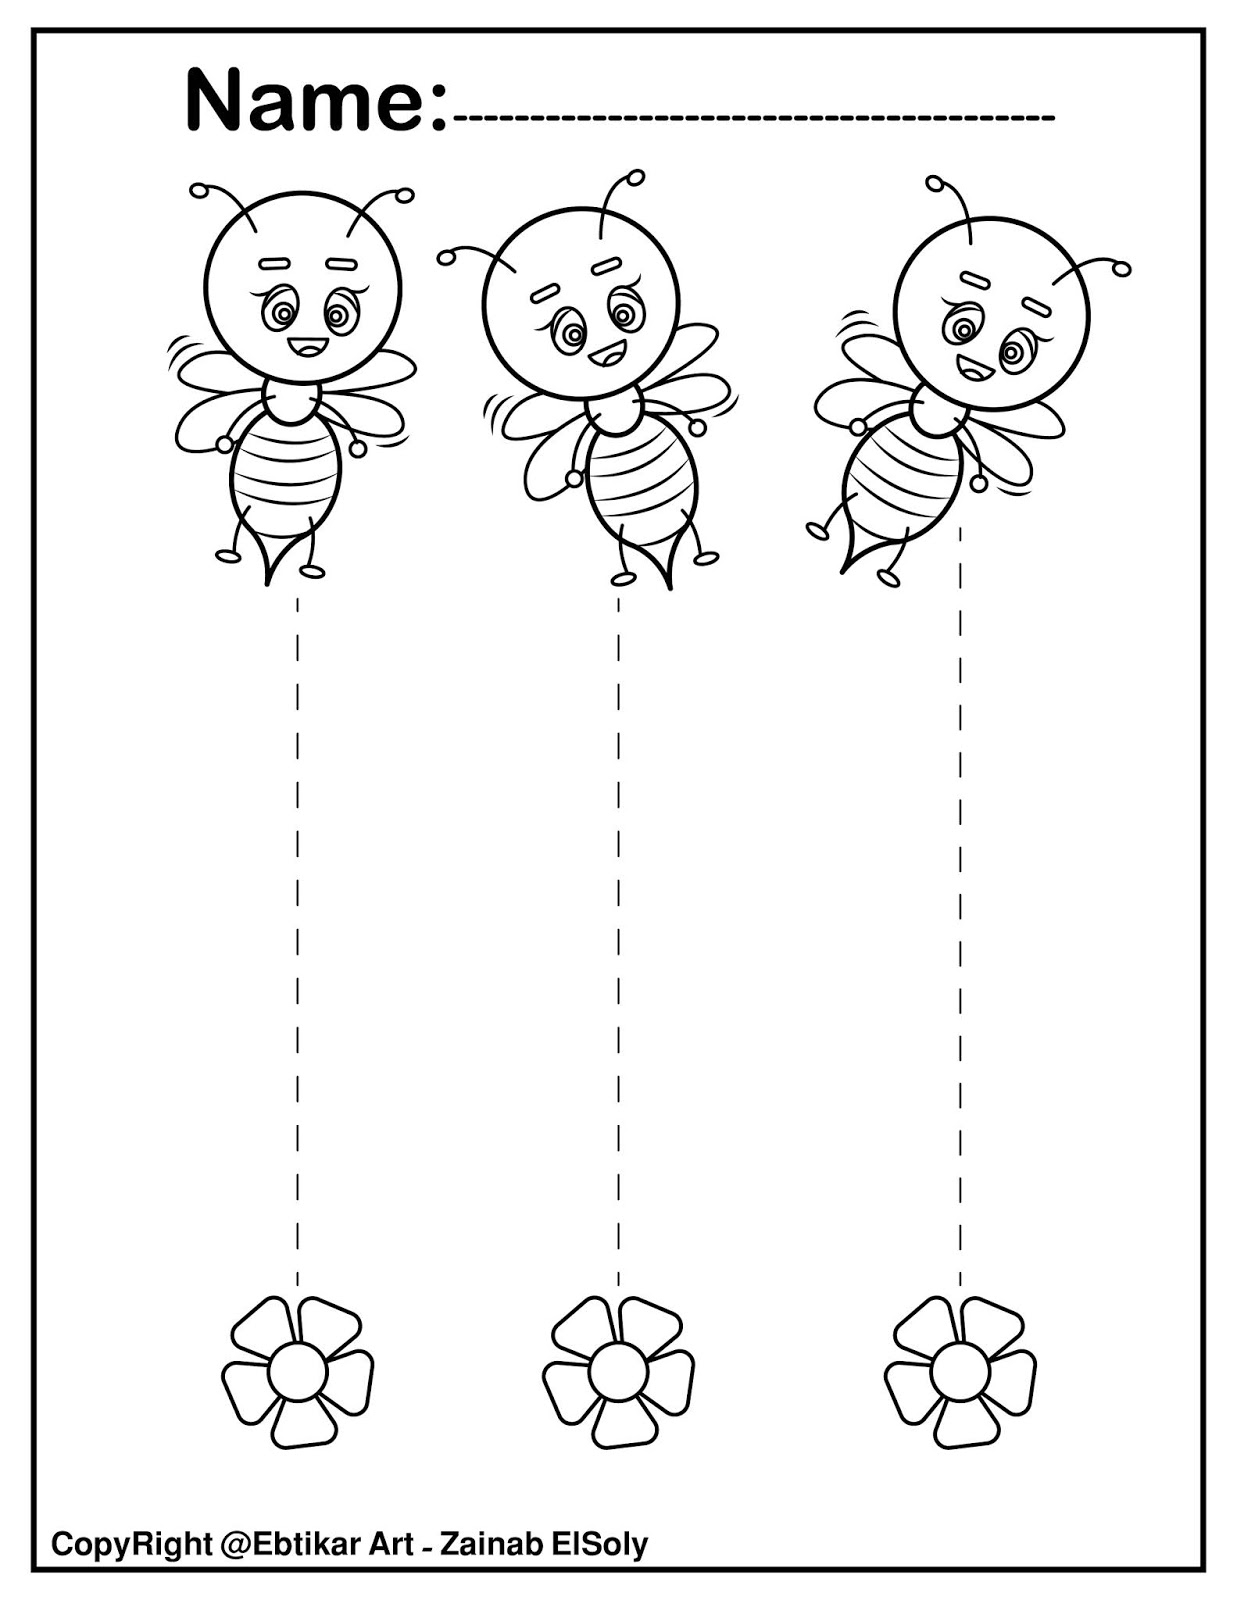 59 Splendi Tracing Worksheets Preschool Scissor Skills Image